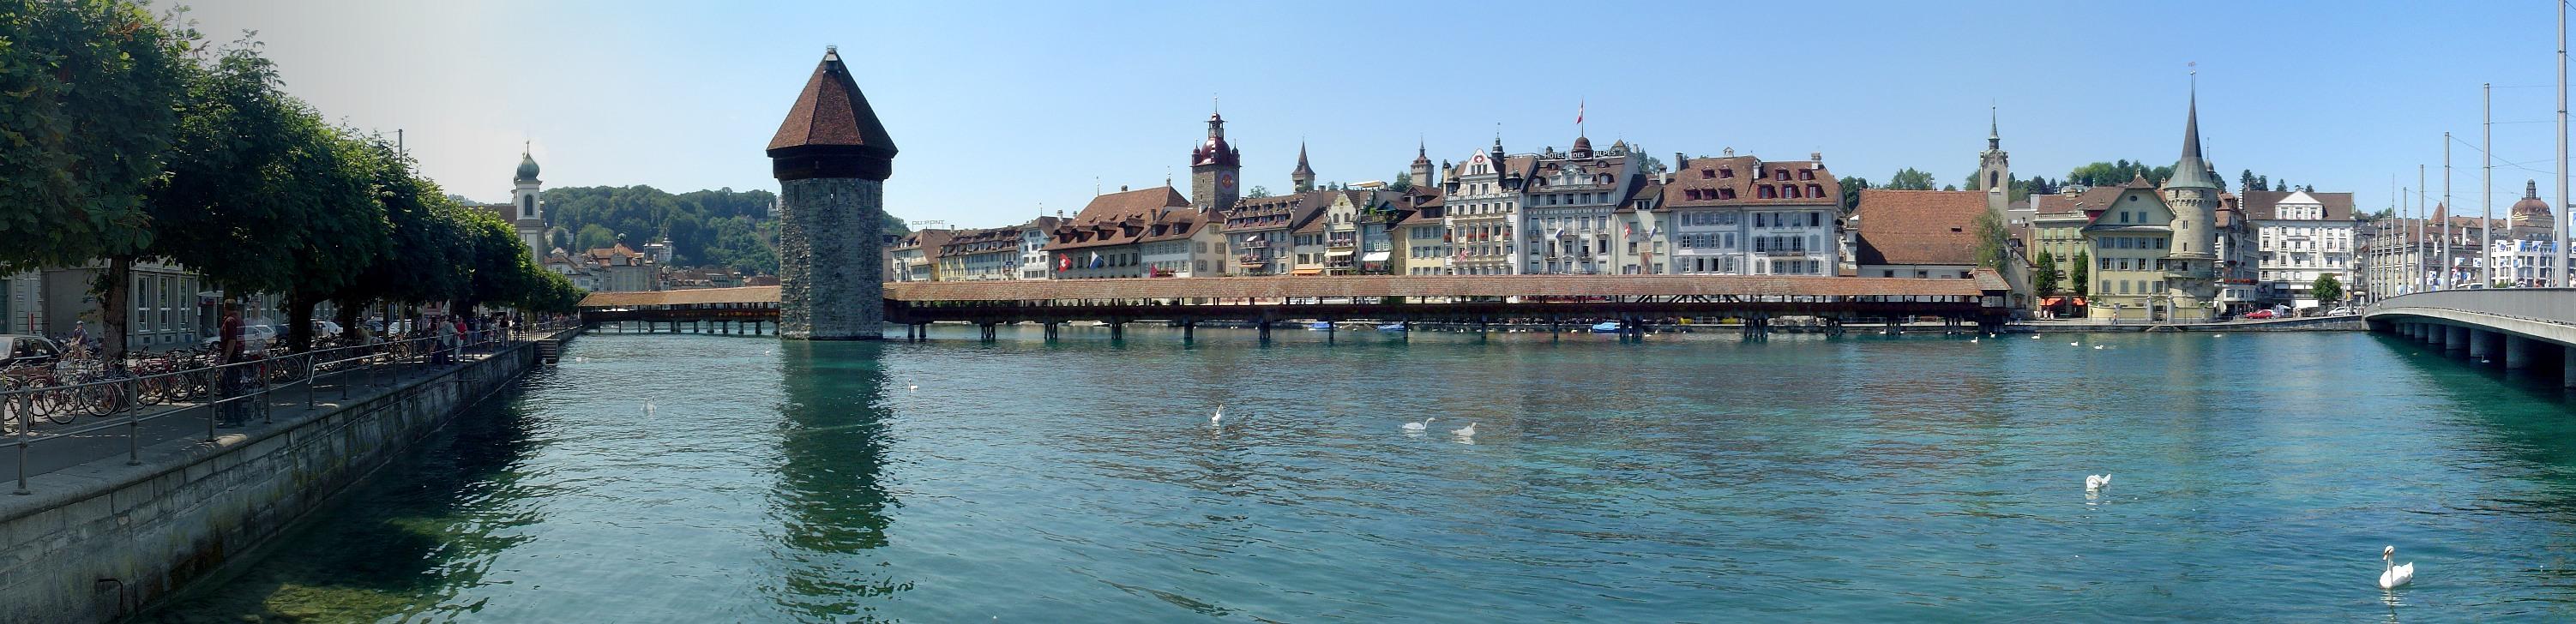 Metti una sera a cena Panorama-Luzern